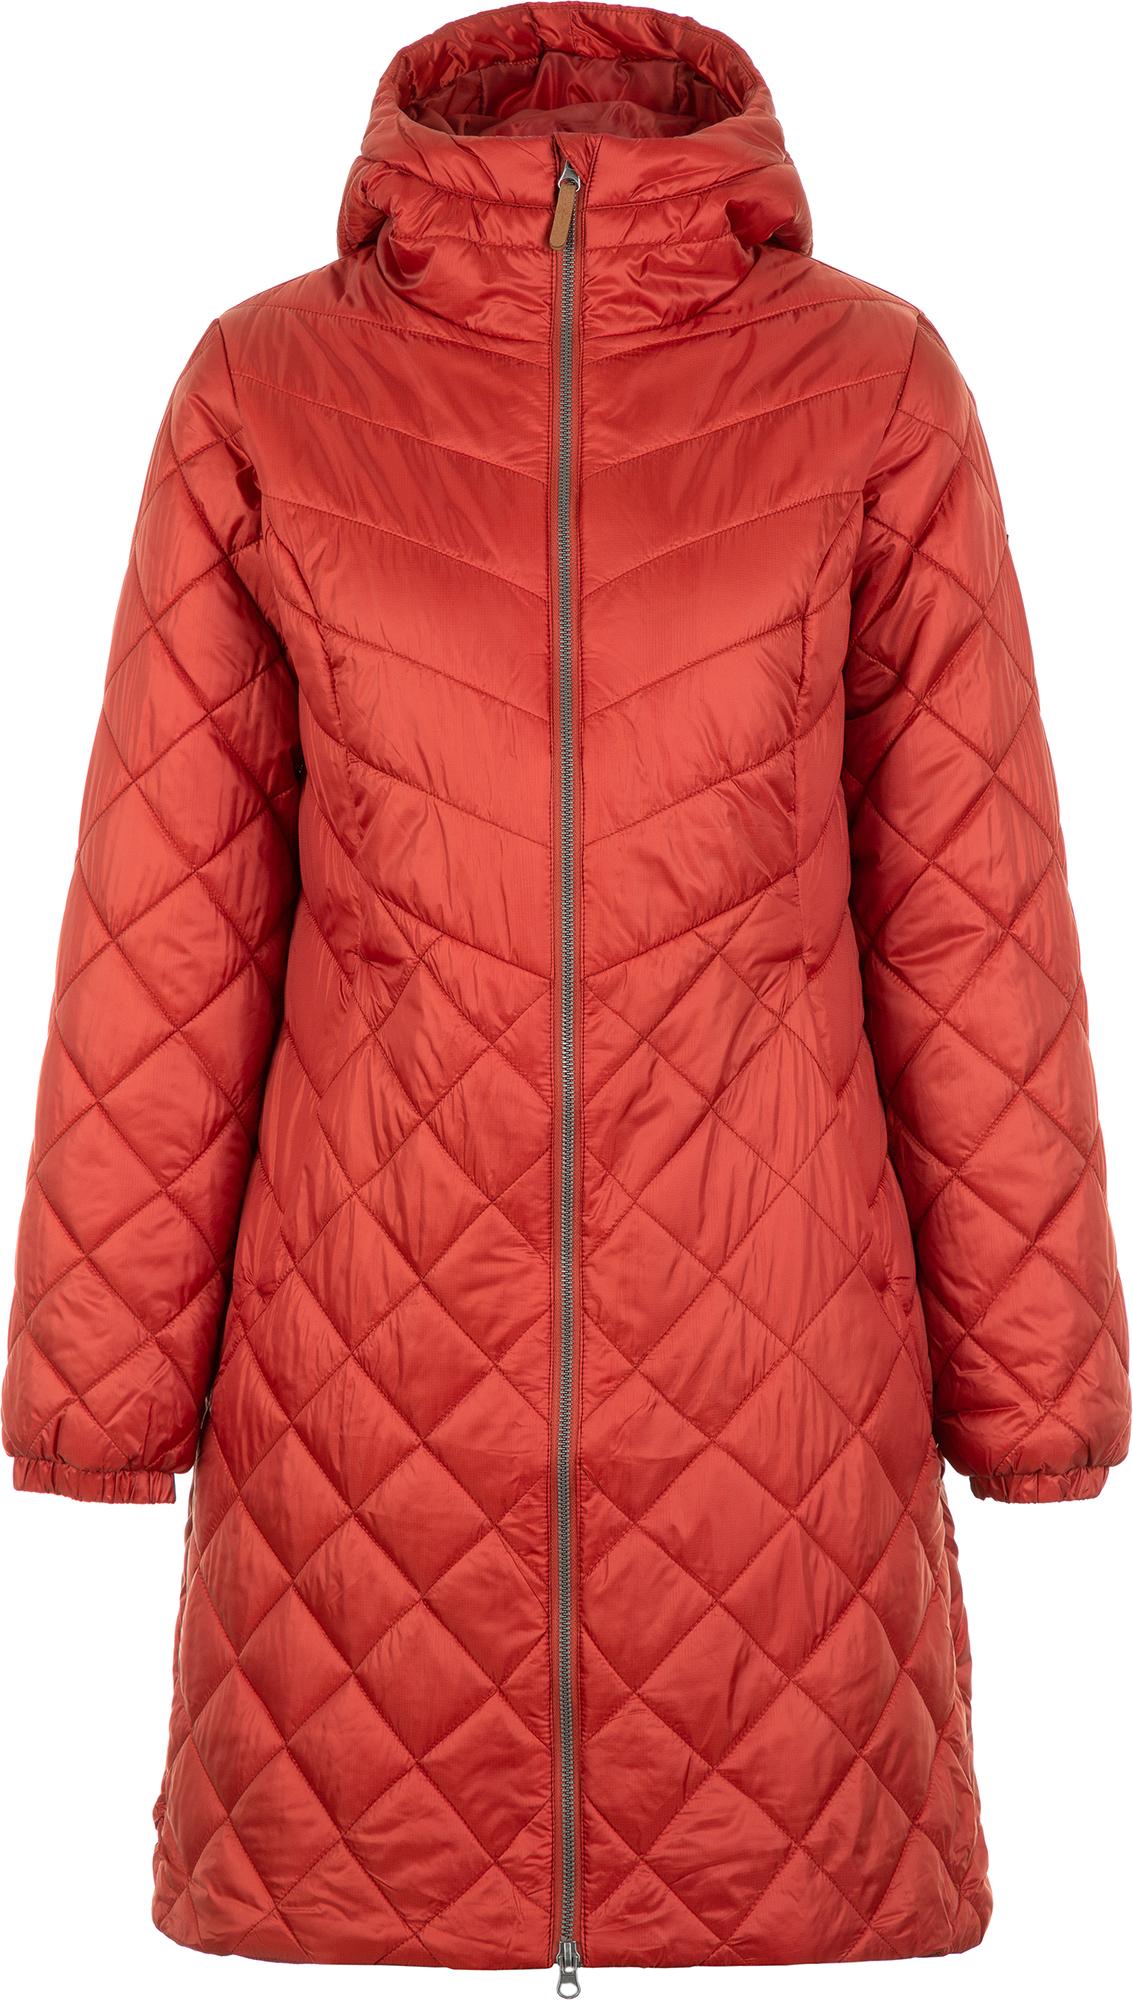 Outventure Куртка утепленная женская Outventure, размер 56